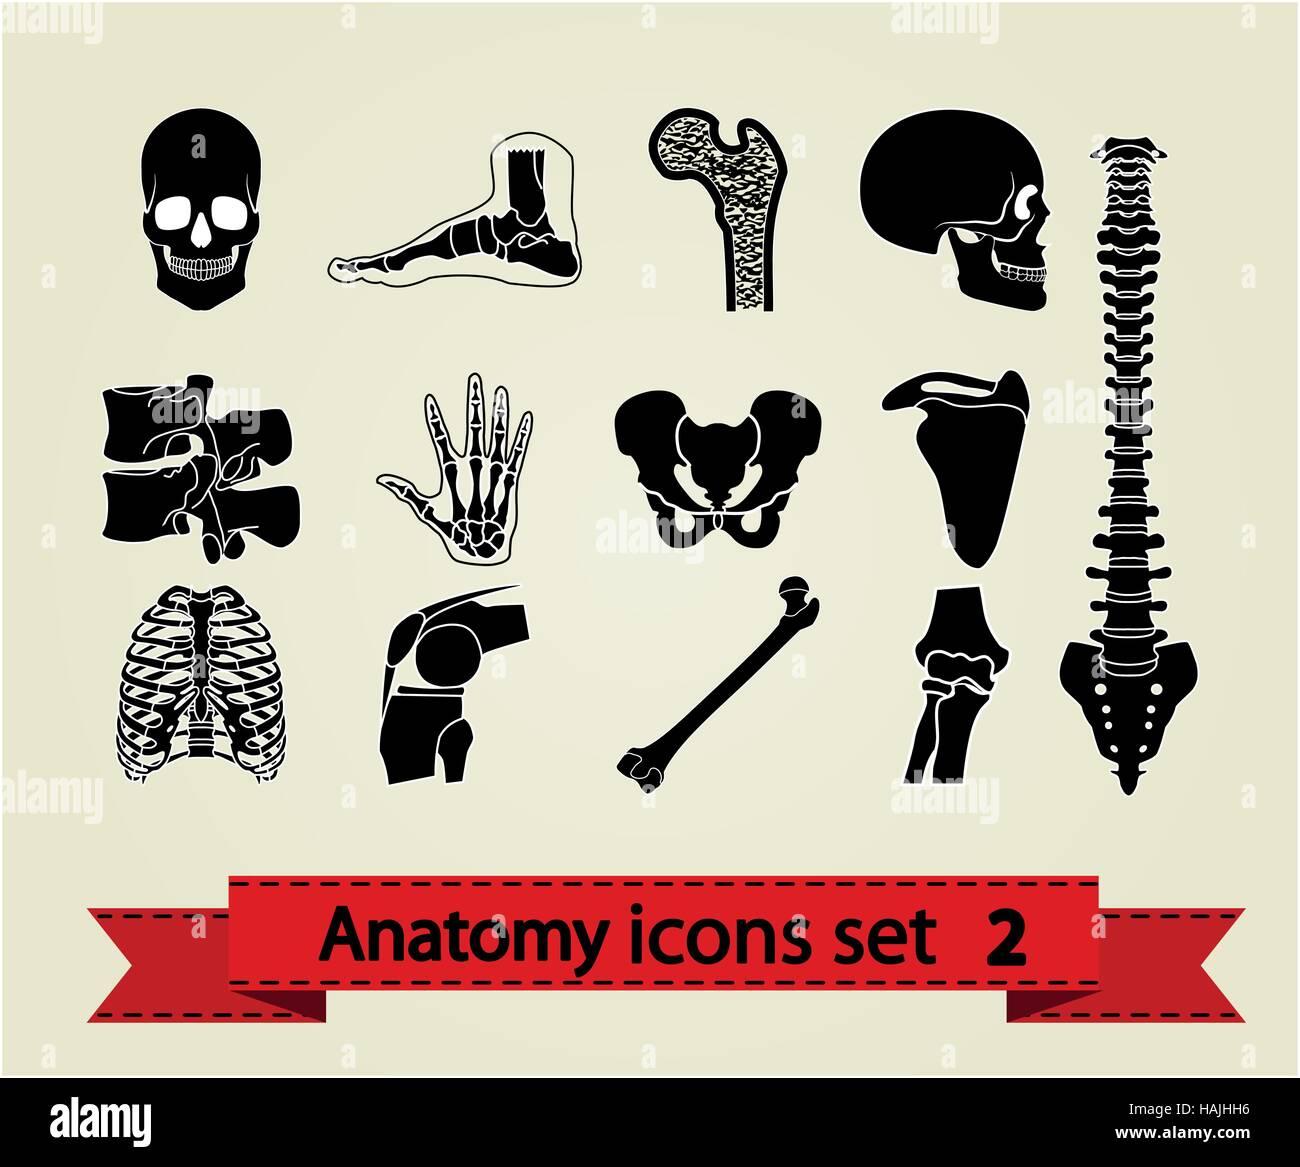 Human anatomy icons parts. Vector illustration eps 8. - Stock Image